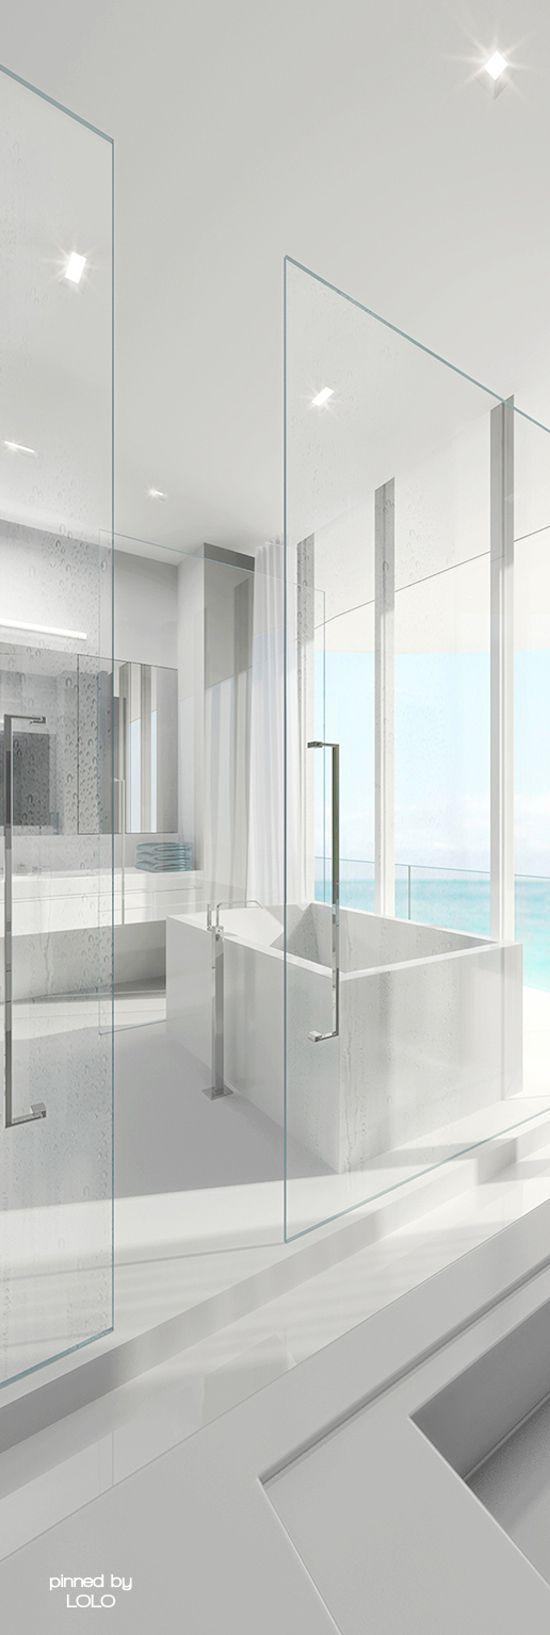 2497 best LUXURY BEACH HOMES images on Pinterest | Luxury beach ...